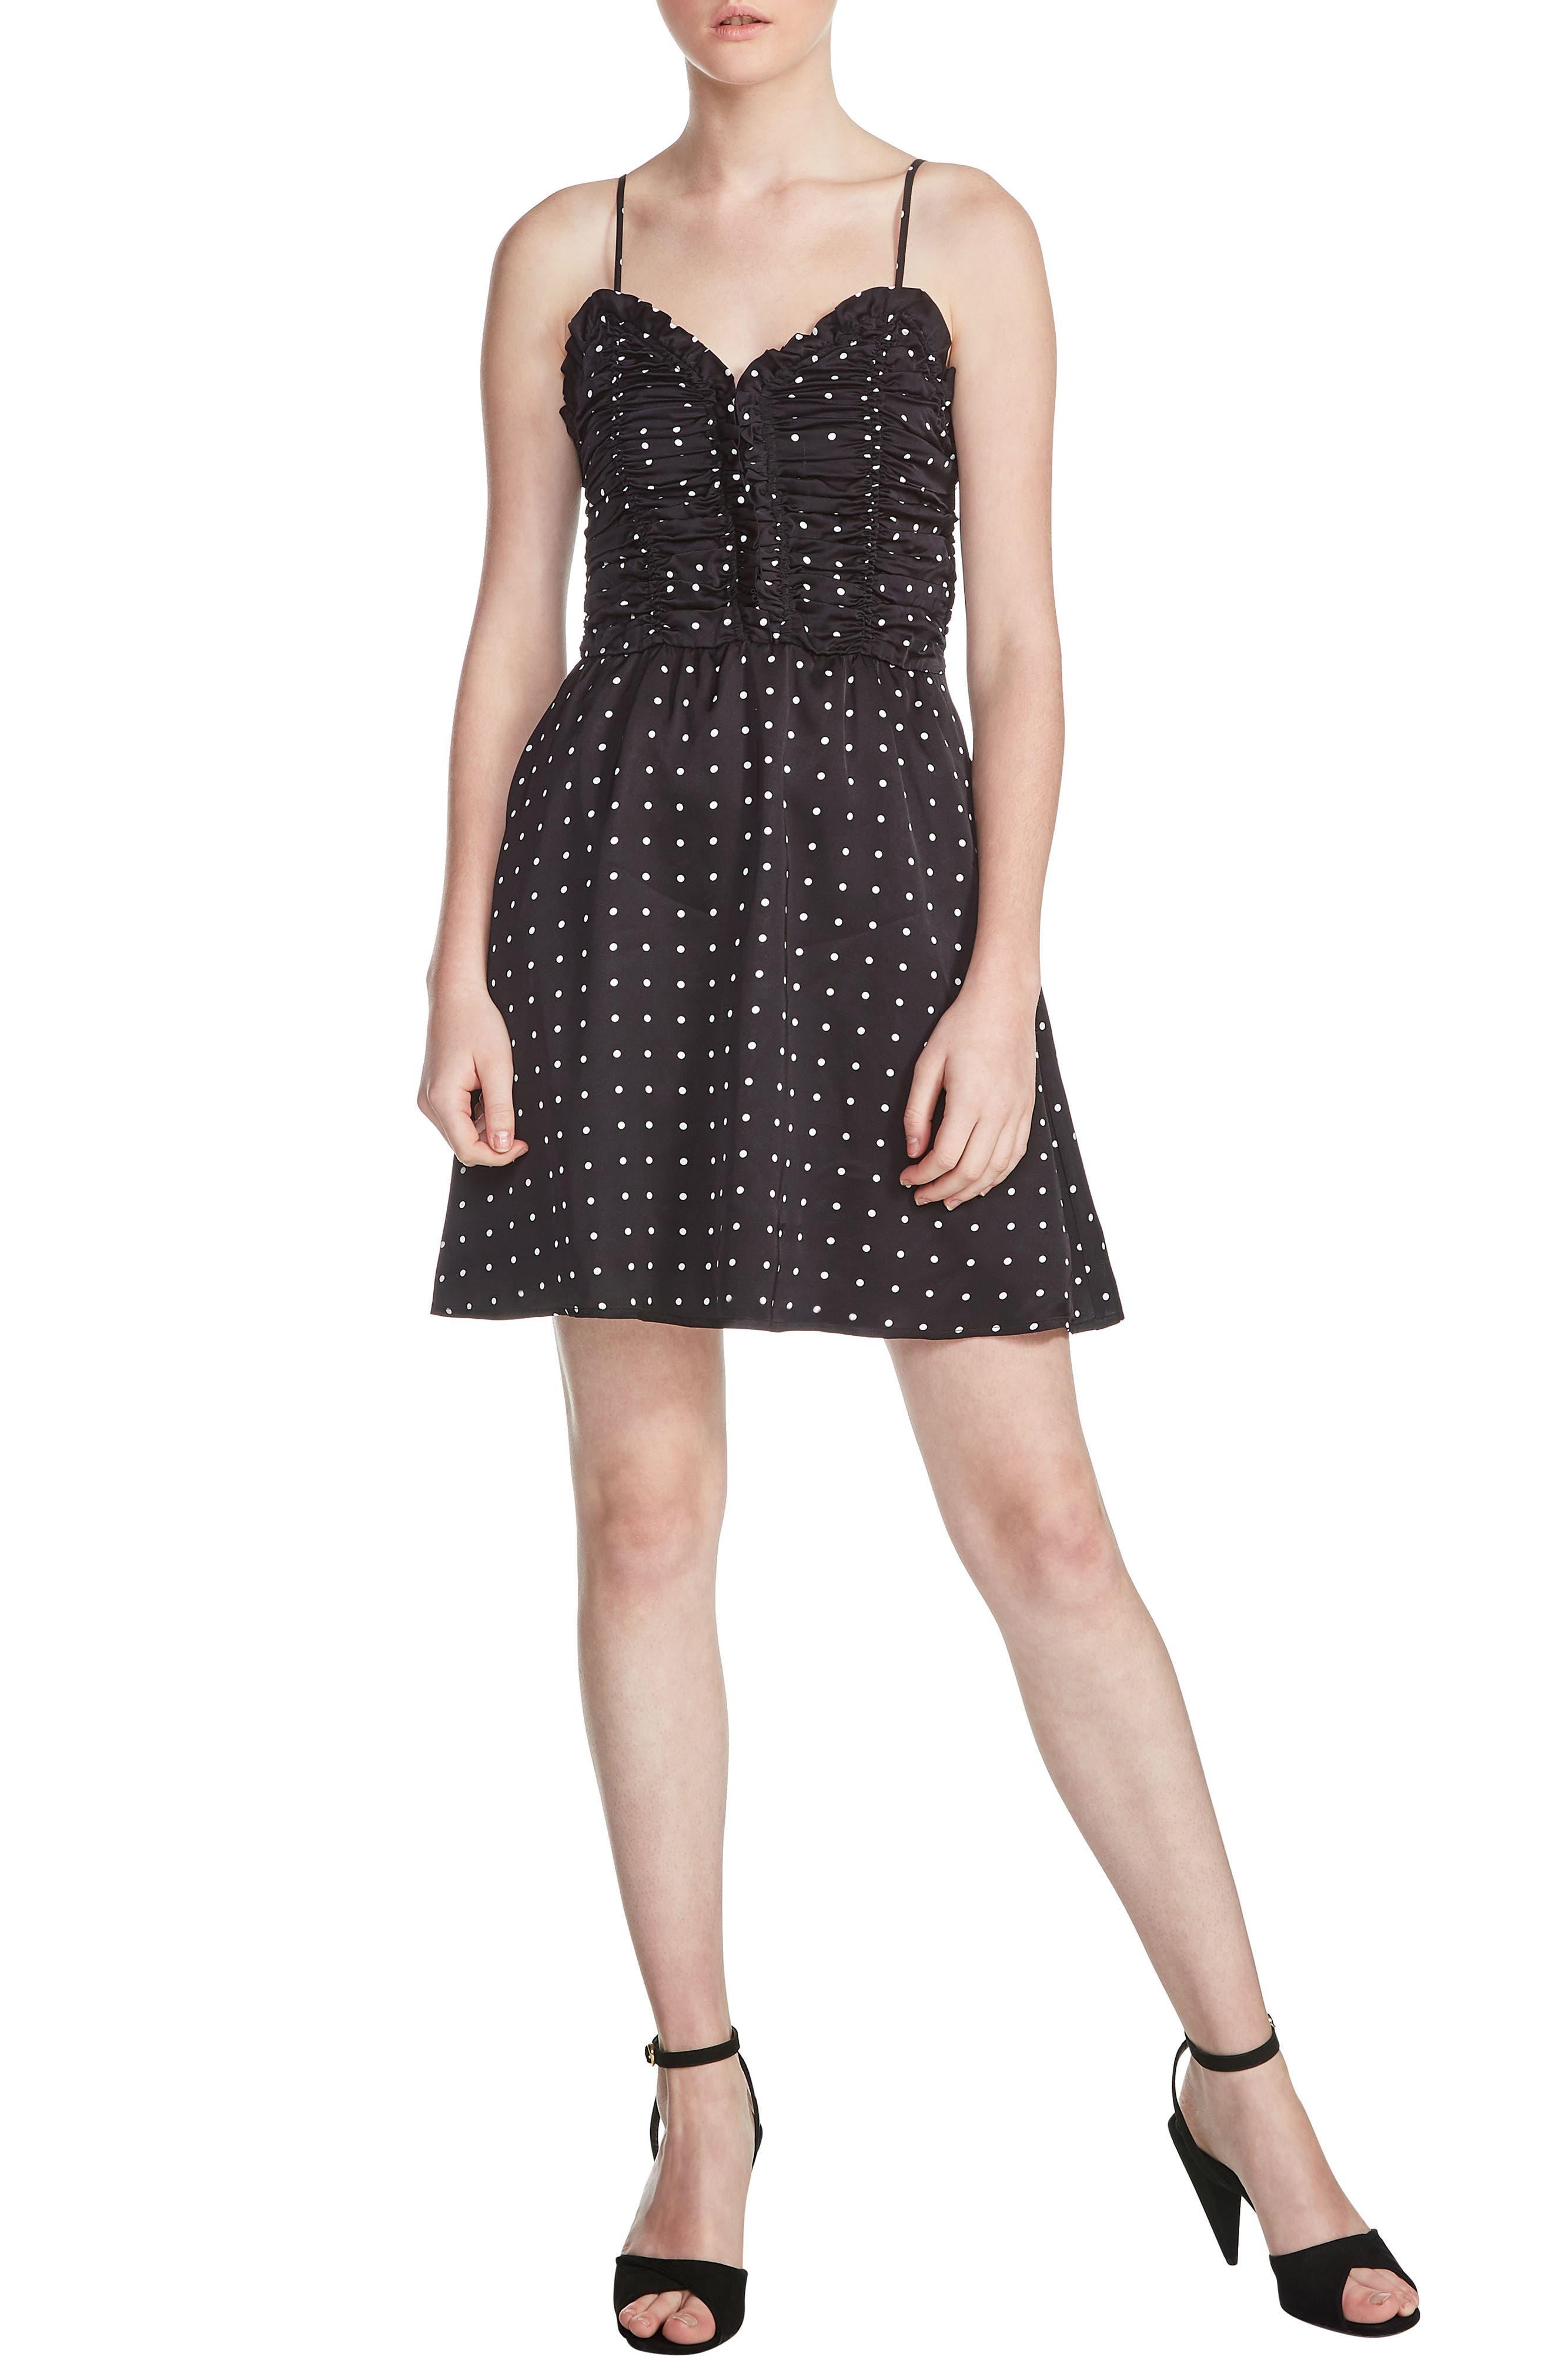 Renota Polka Dot Fit & Flare Dress,                         Main,                         color, Black